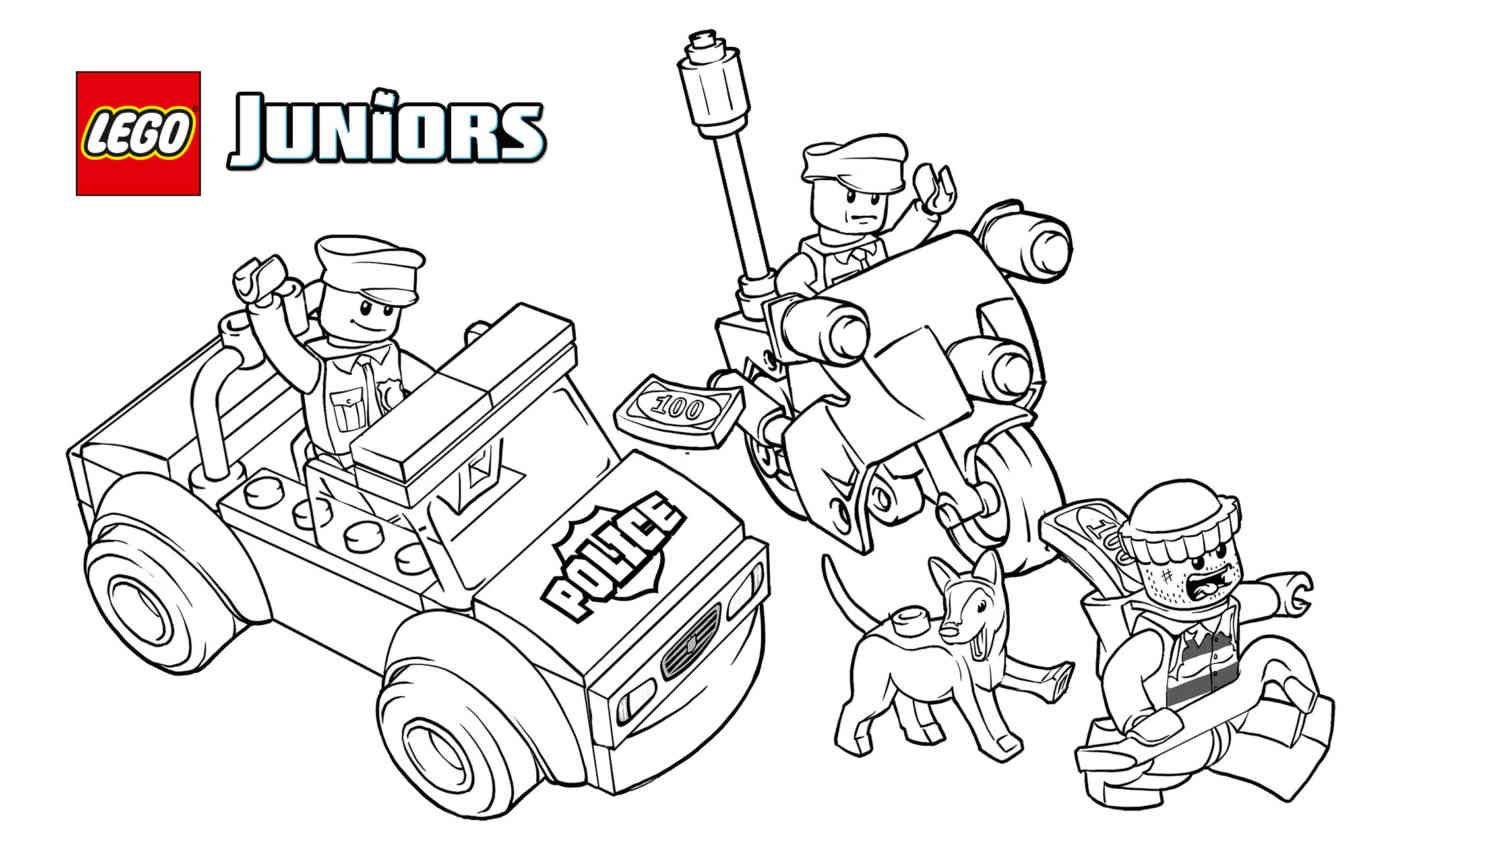 LEGO 10675 Police – The Big Escape 1 coloring sheet. | Lego | Pinterest